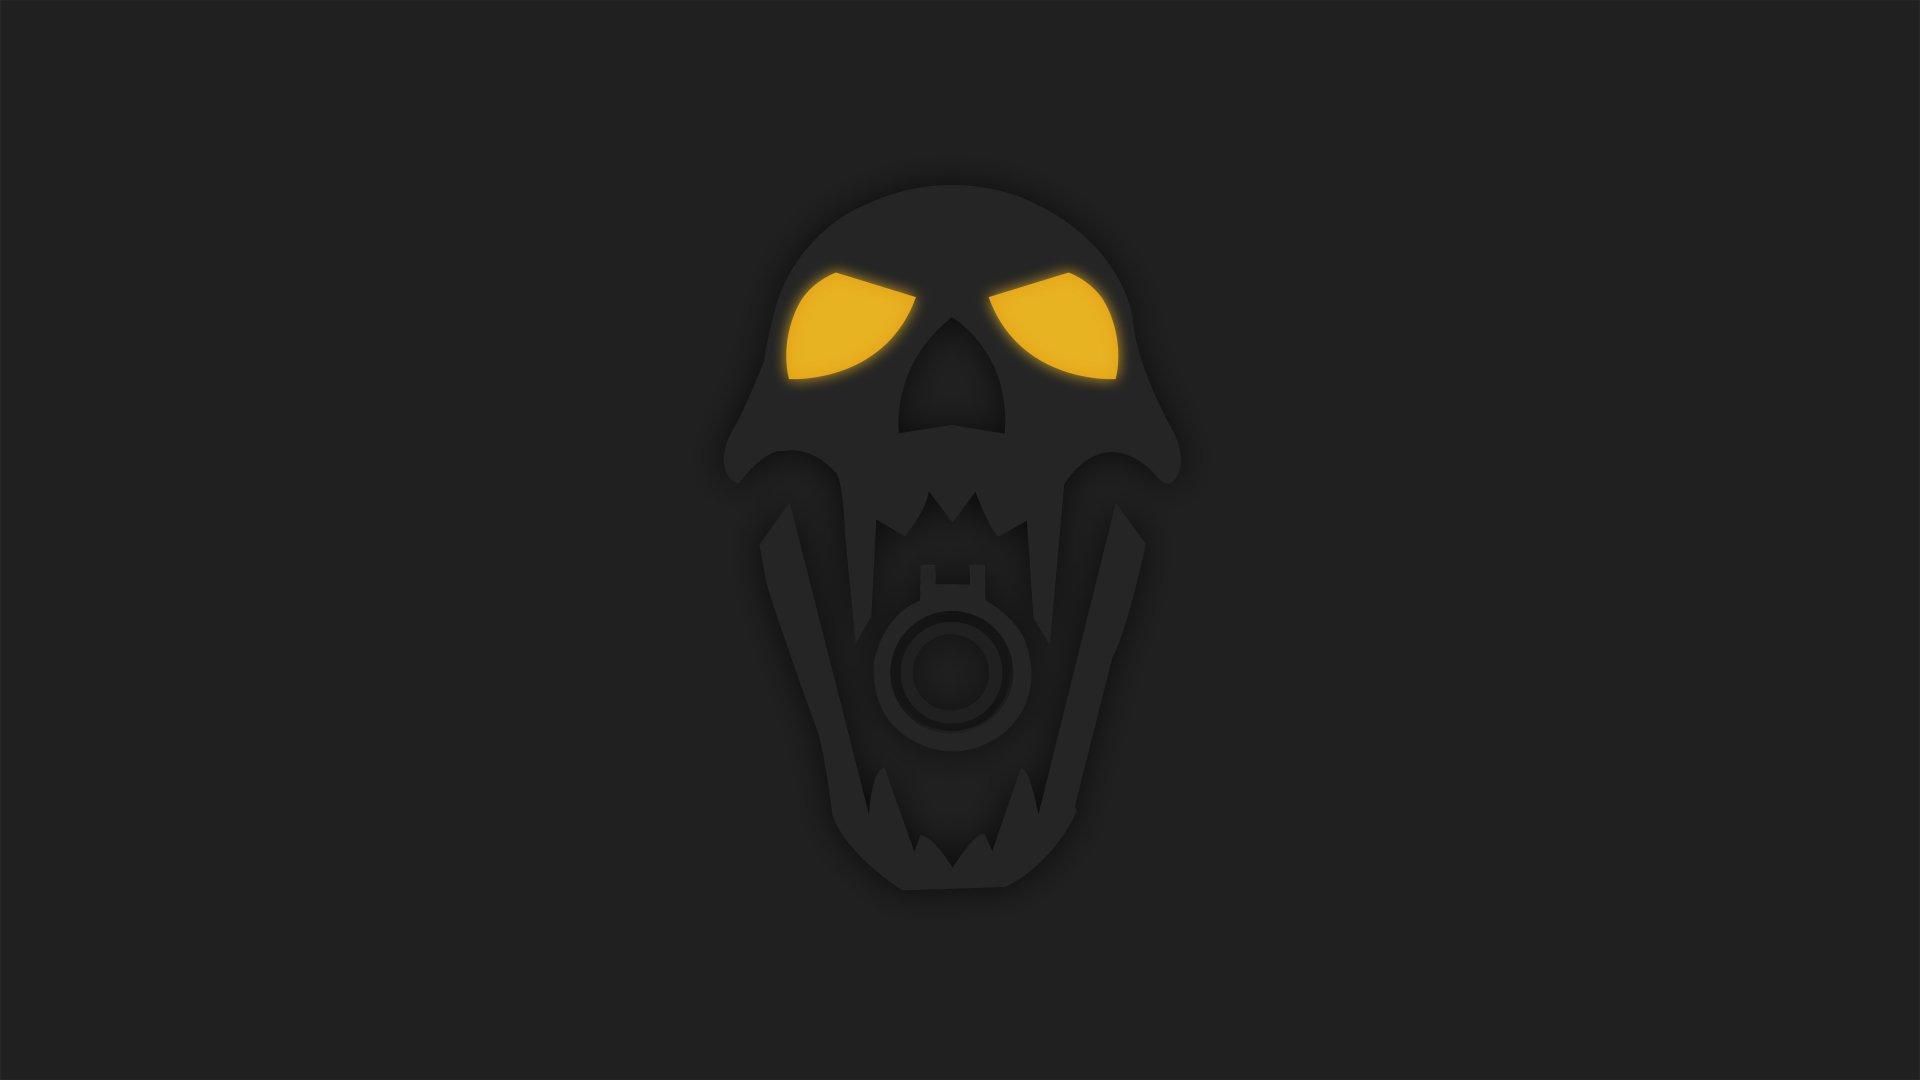 Video Game - Tom Clancy's Rainbow Six: Siege  Minimalist Blackbeard (Tom Clancy's Rainbow Six: Siege) Yellow Eyes Skull Wallpaper